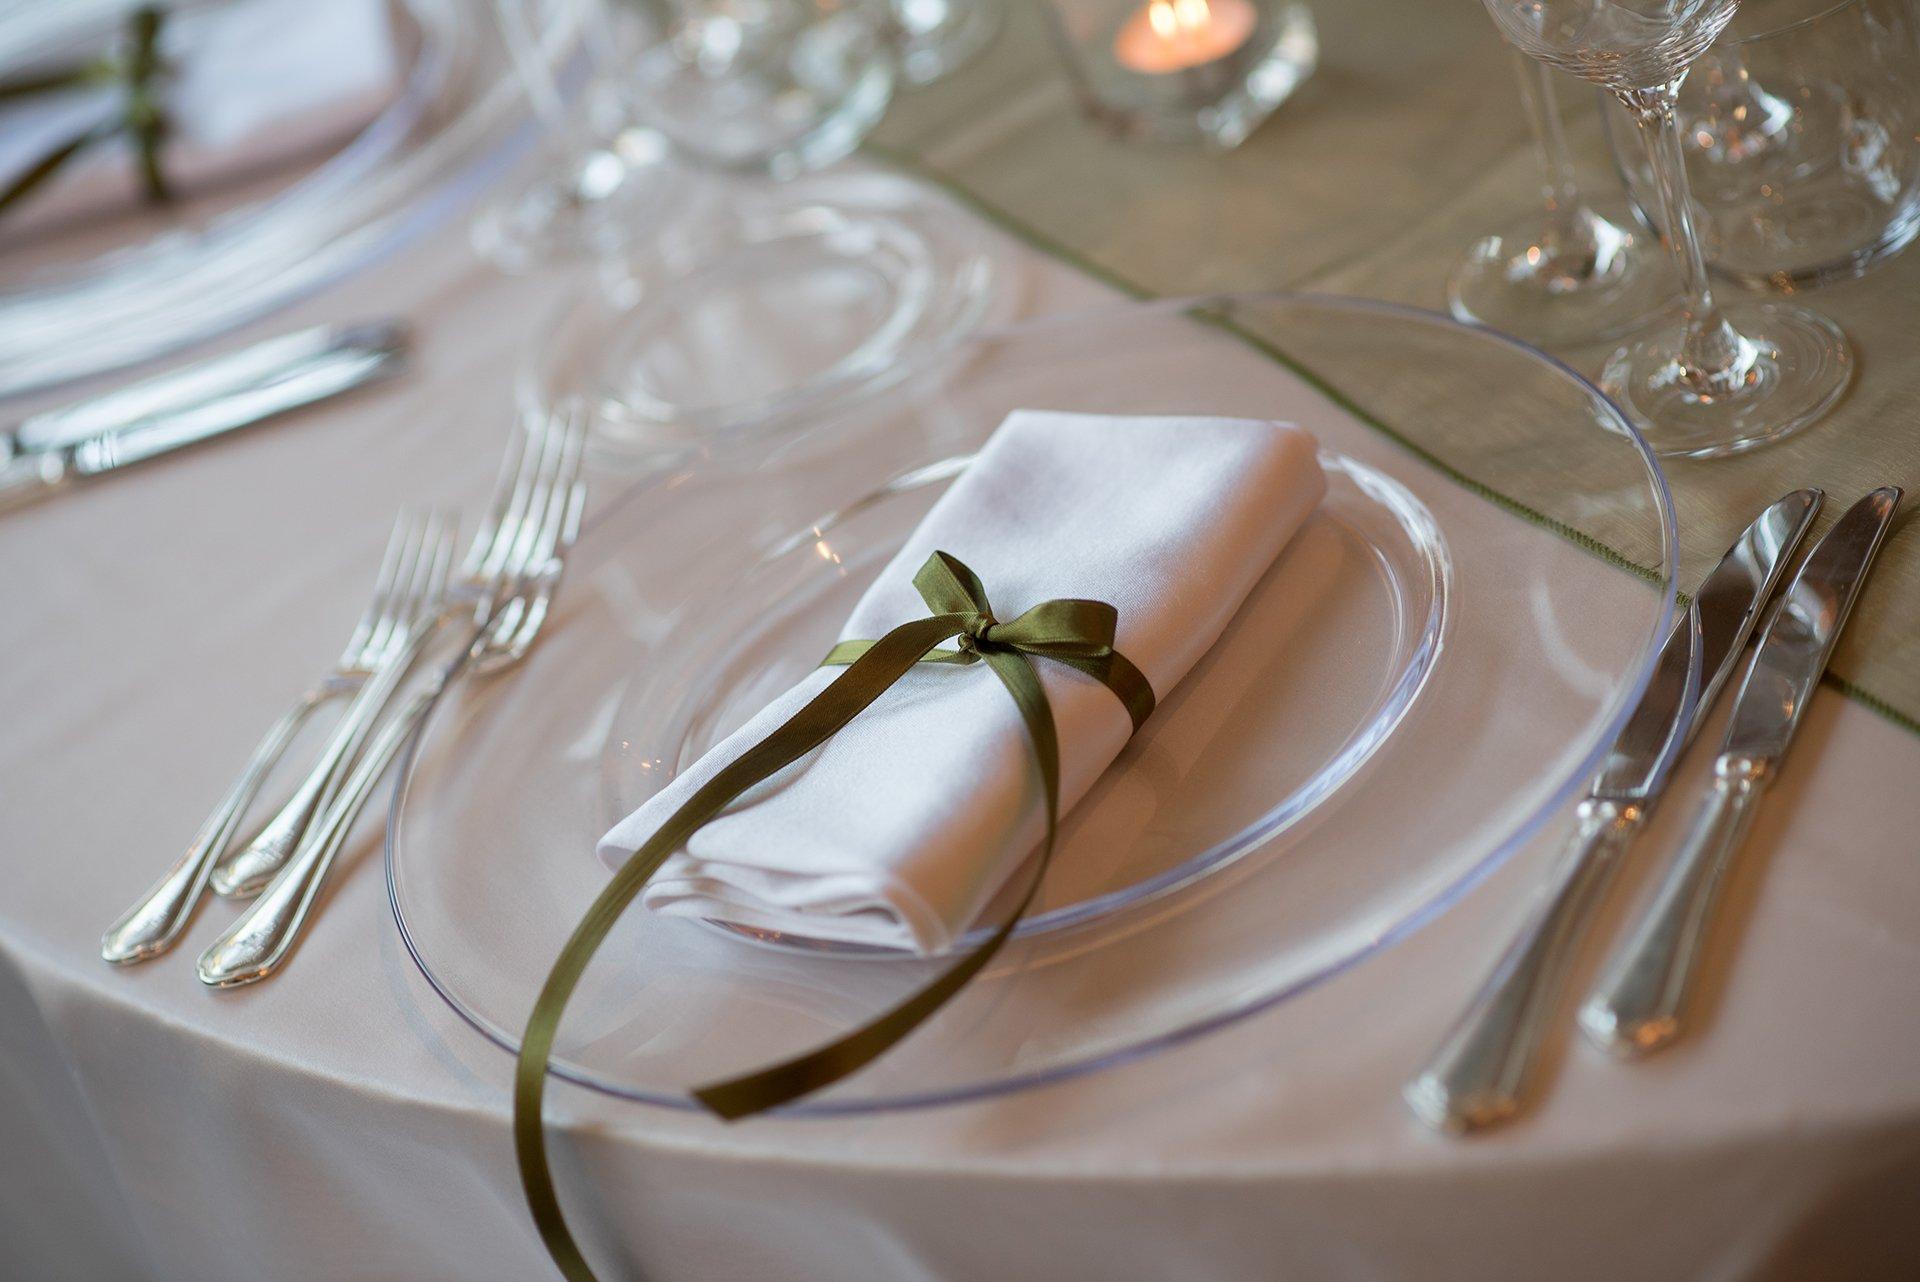 posto a tavola per un matrimonio